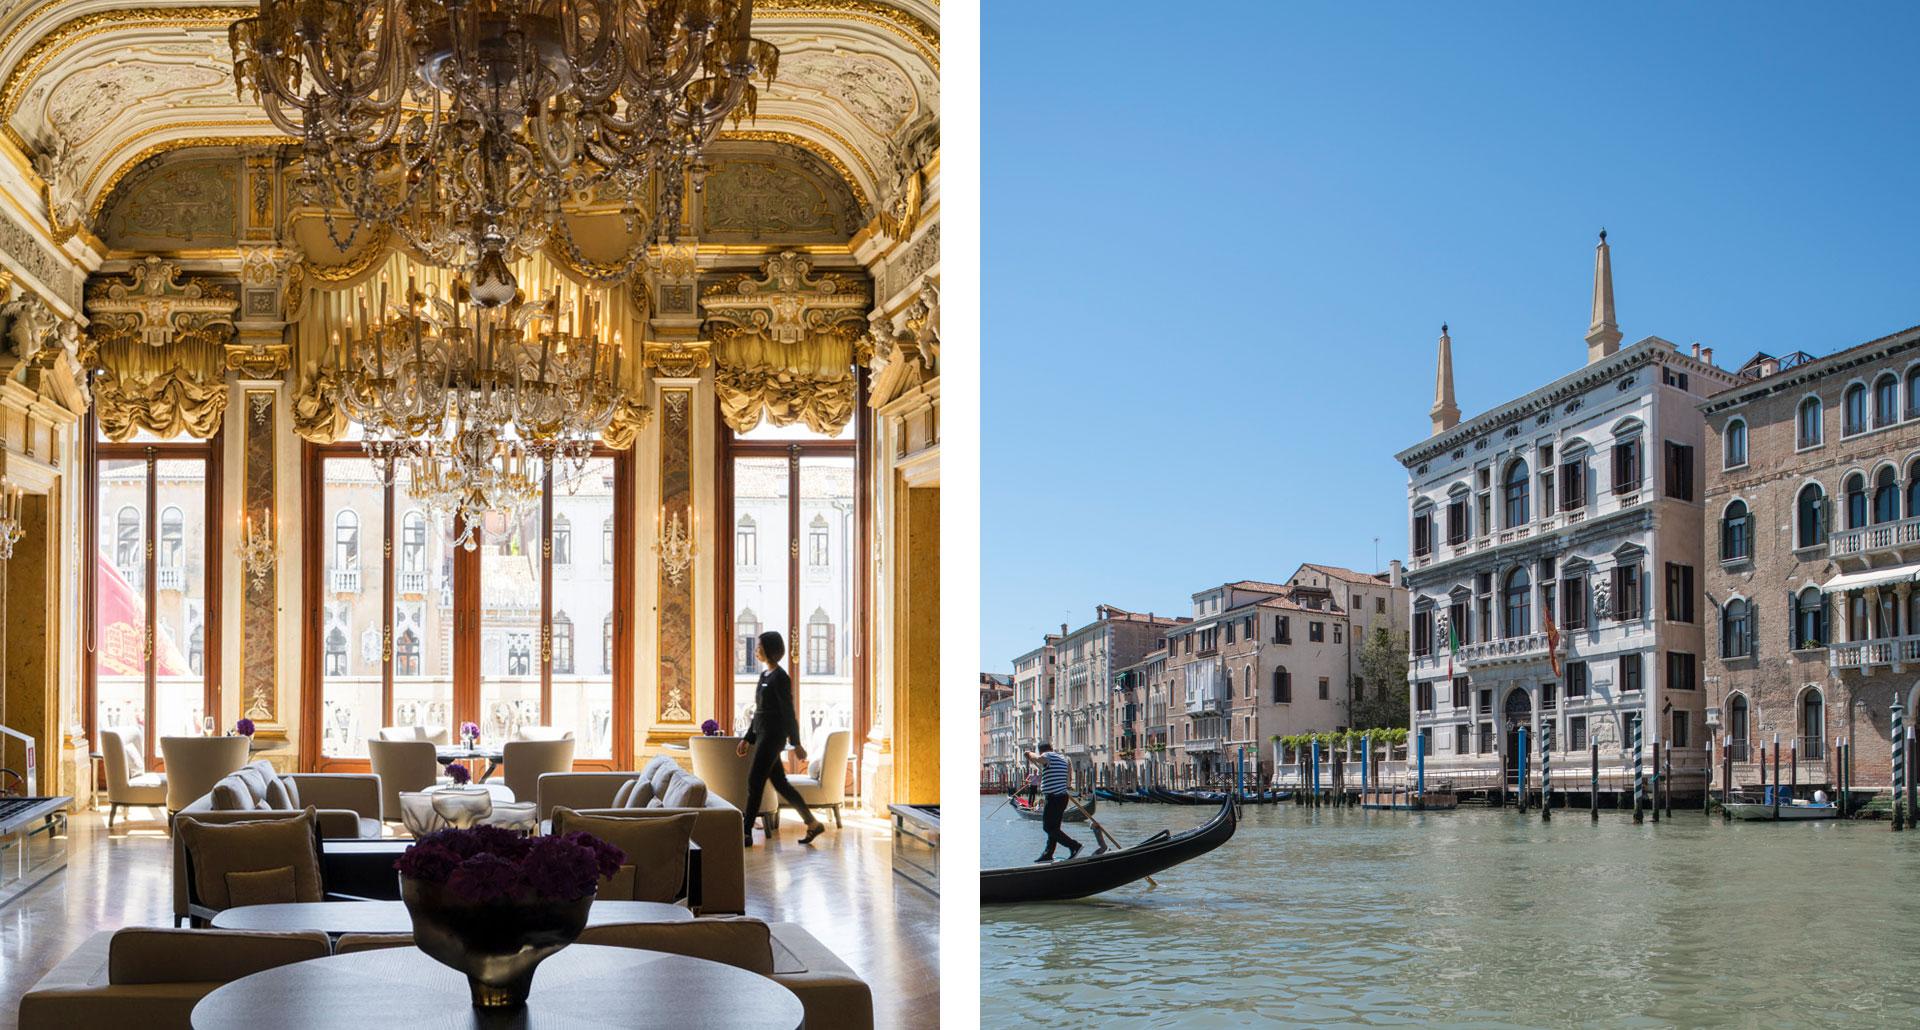 Aman Venice - boutique hotel in Venice